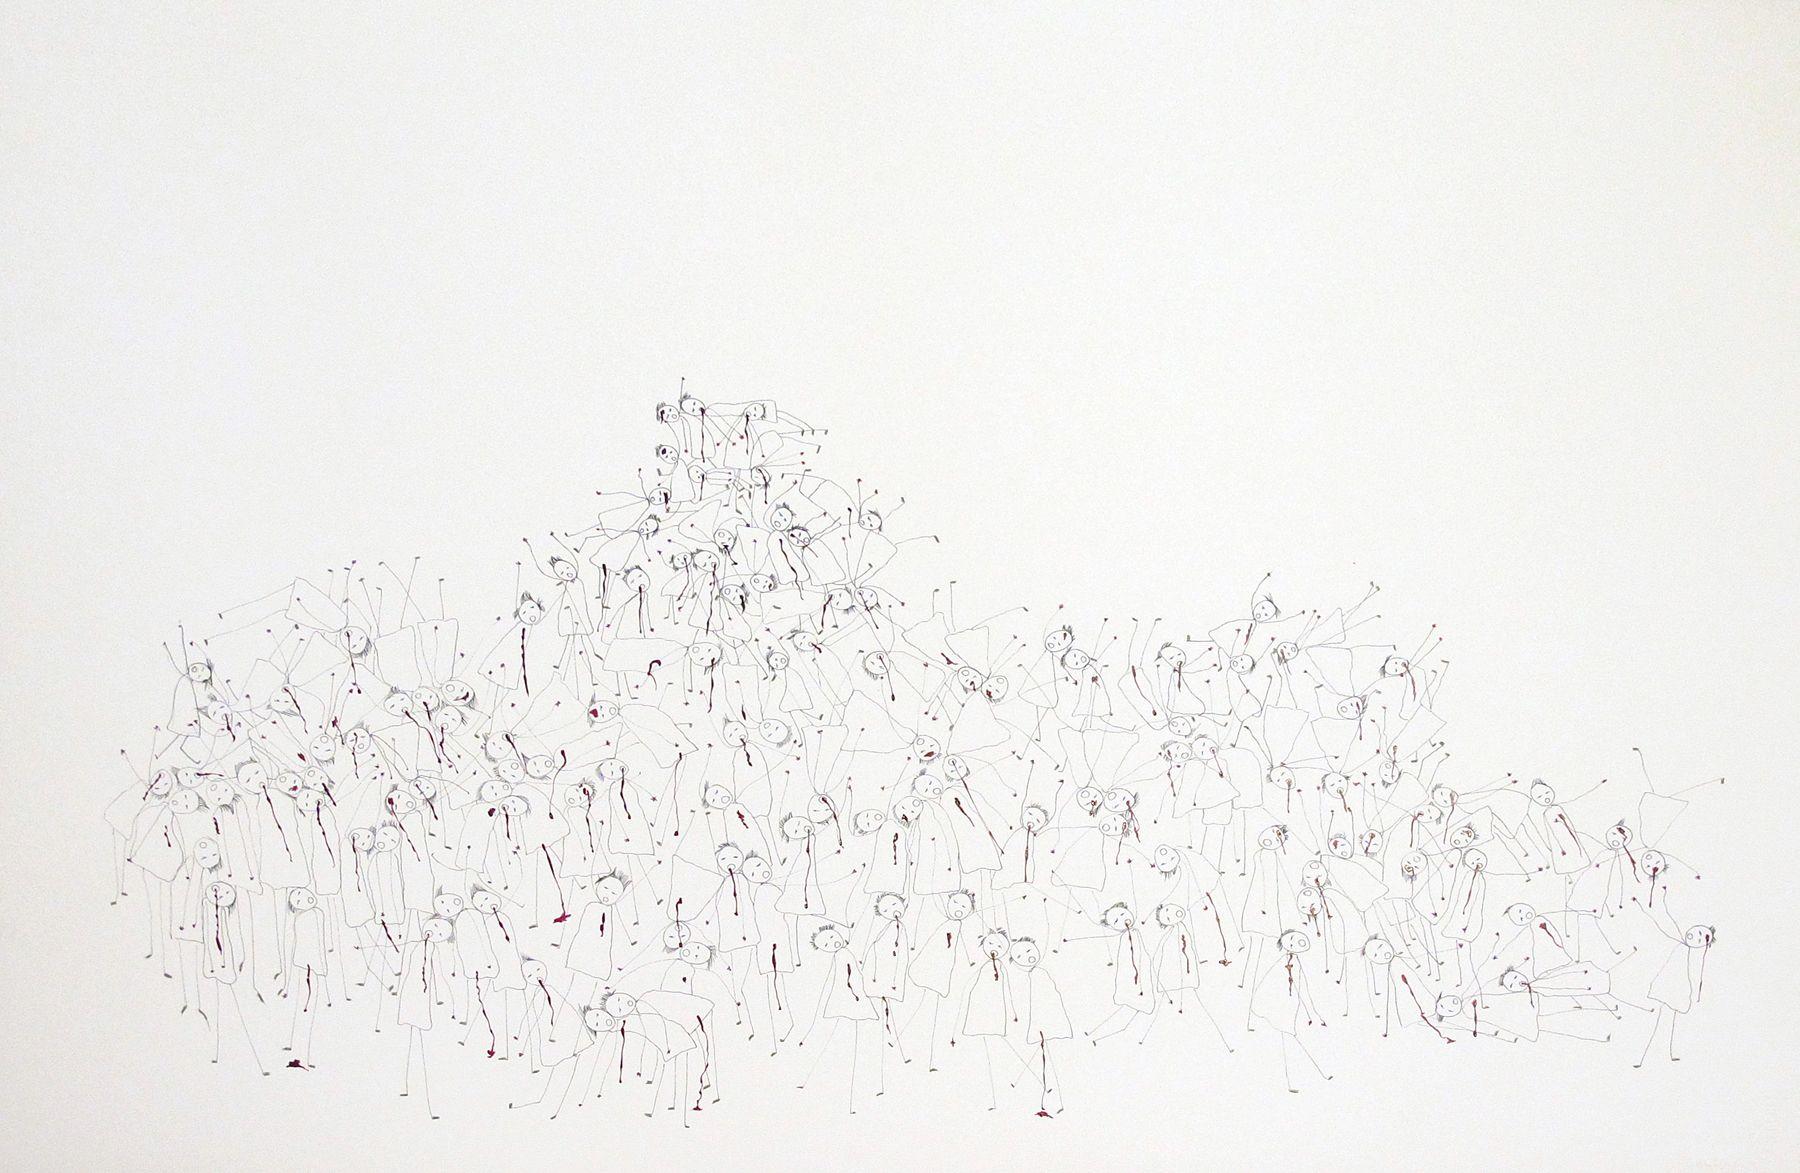 Alice Attie - Proximities - Howard Greenberg Gallery - 2014